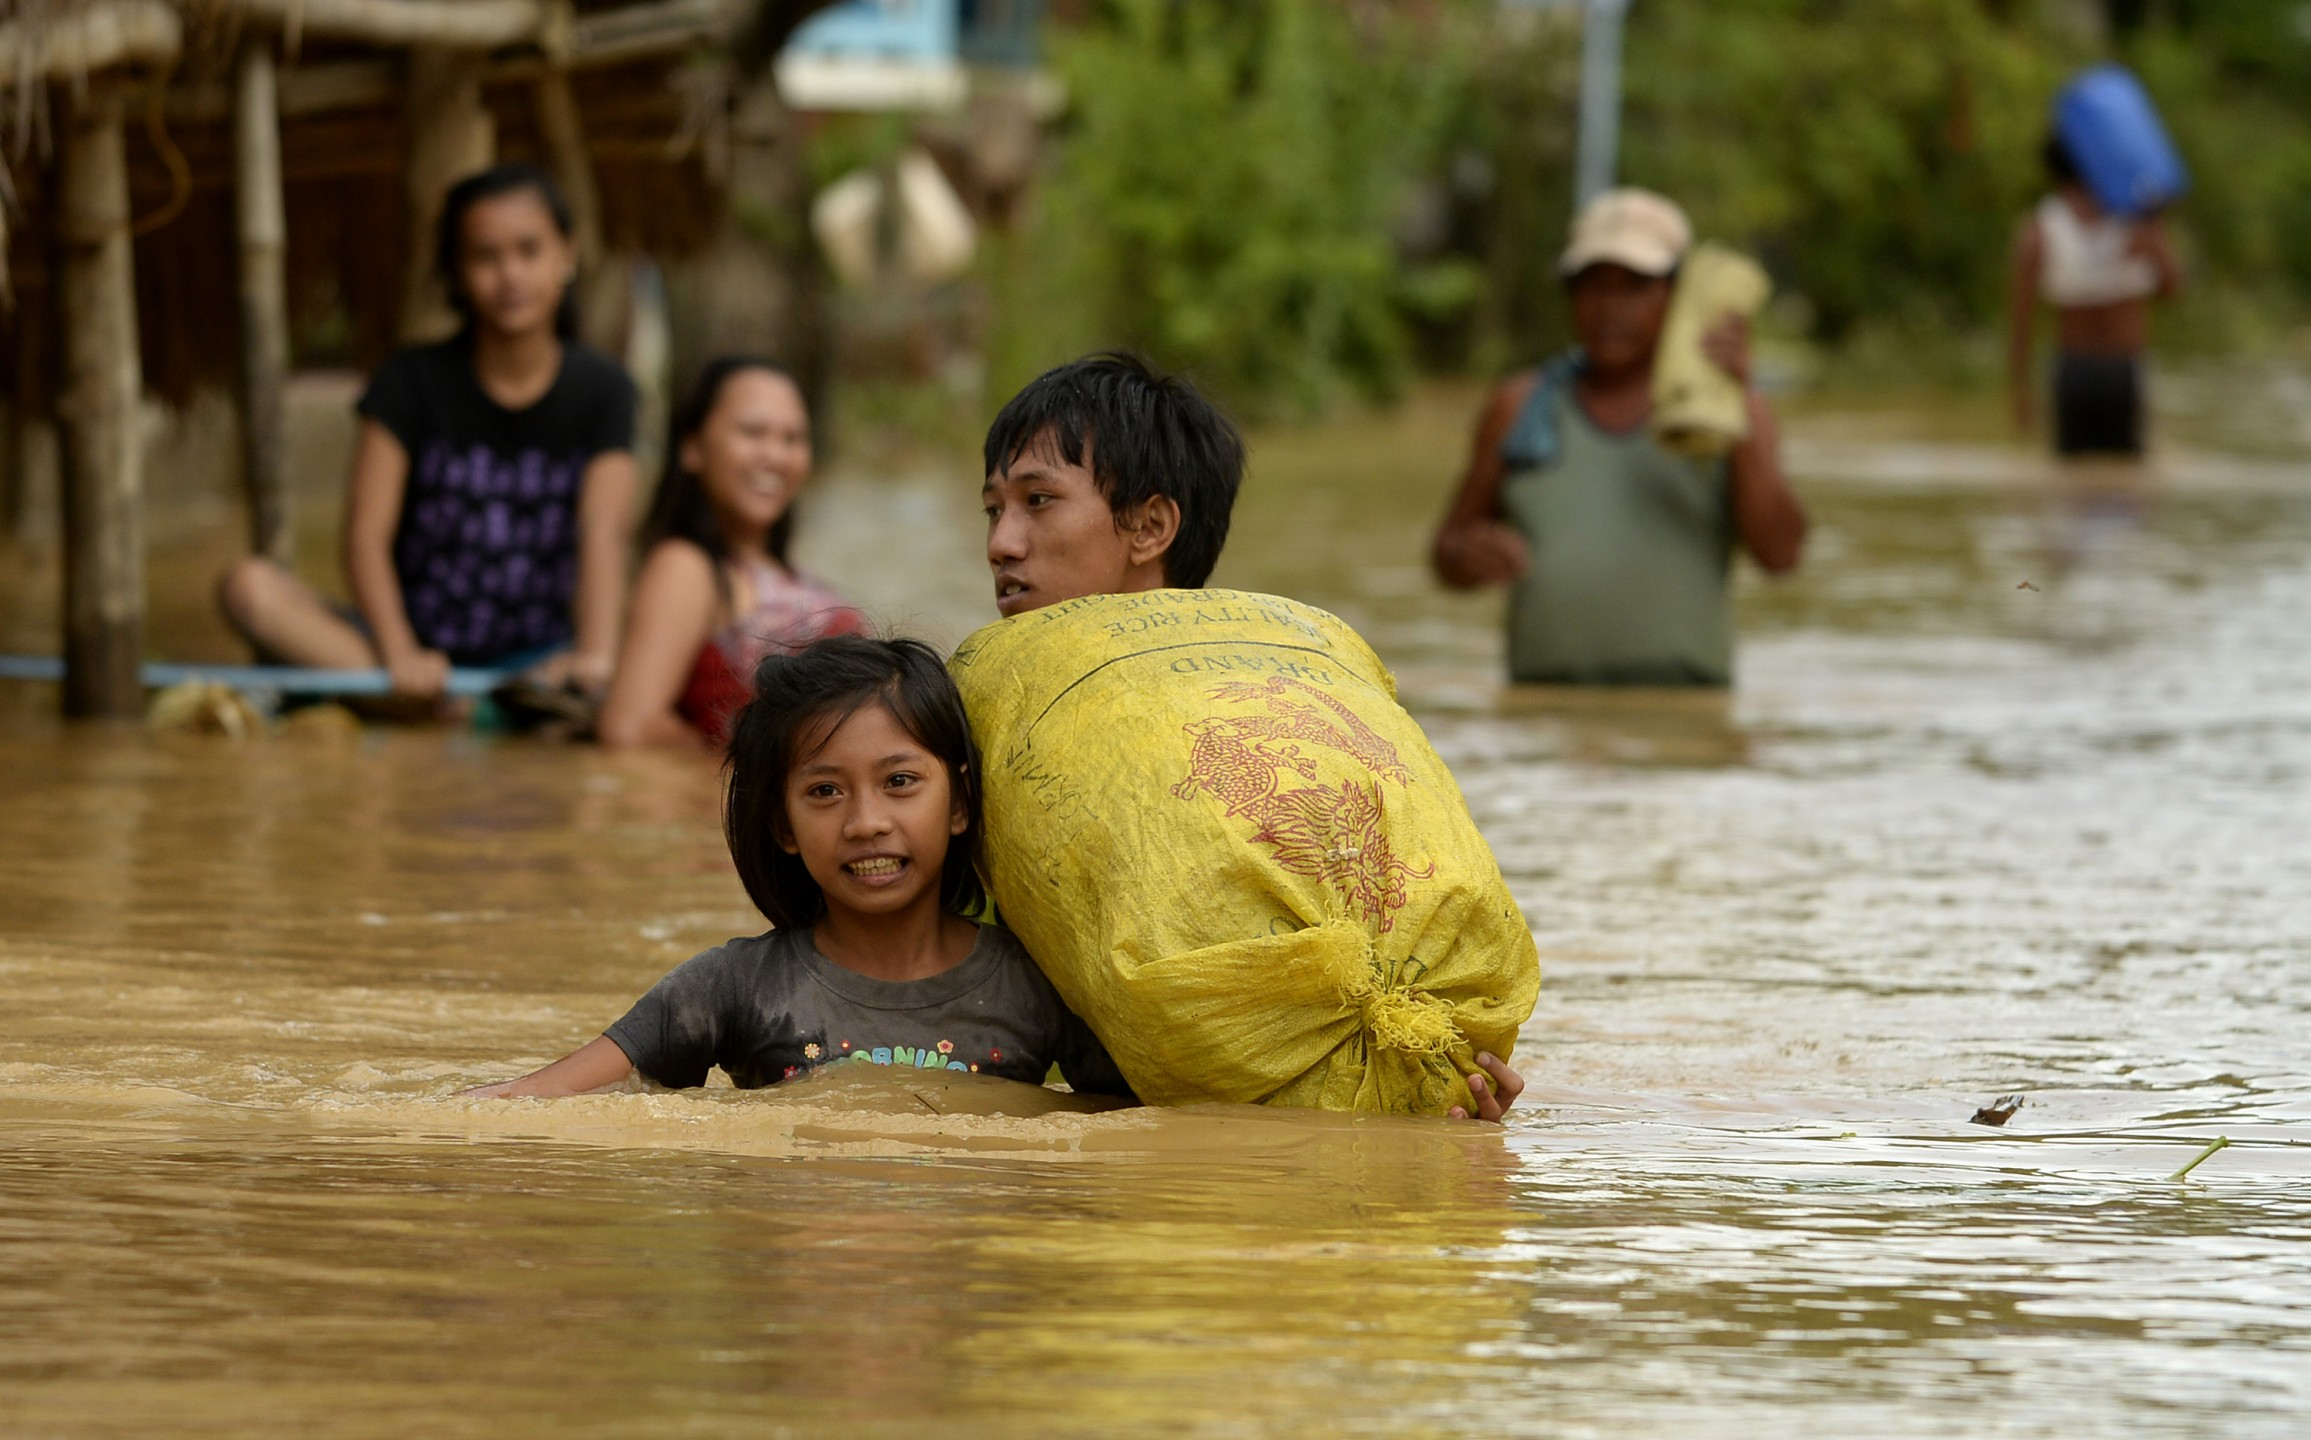 Overstroming Filipijnen na typhoon Kuppo. Foto: Flickr (cc)